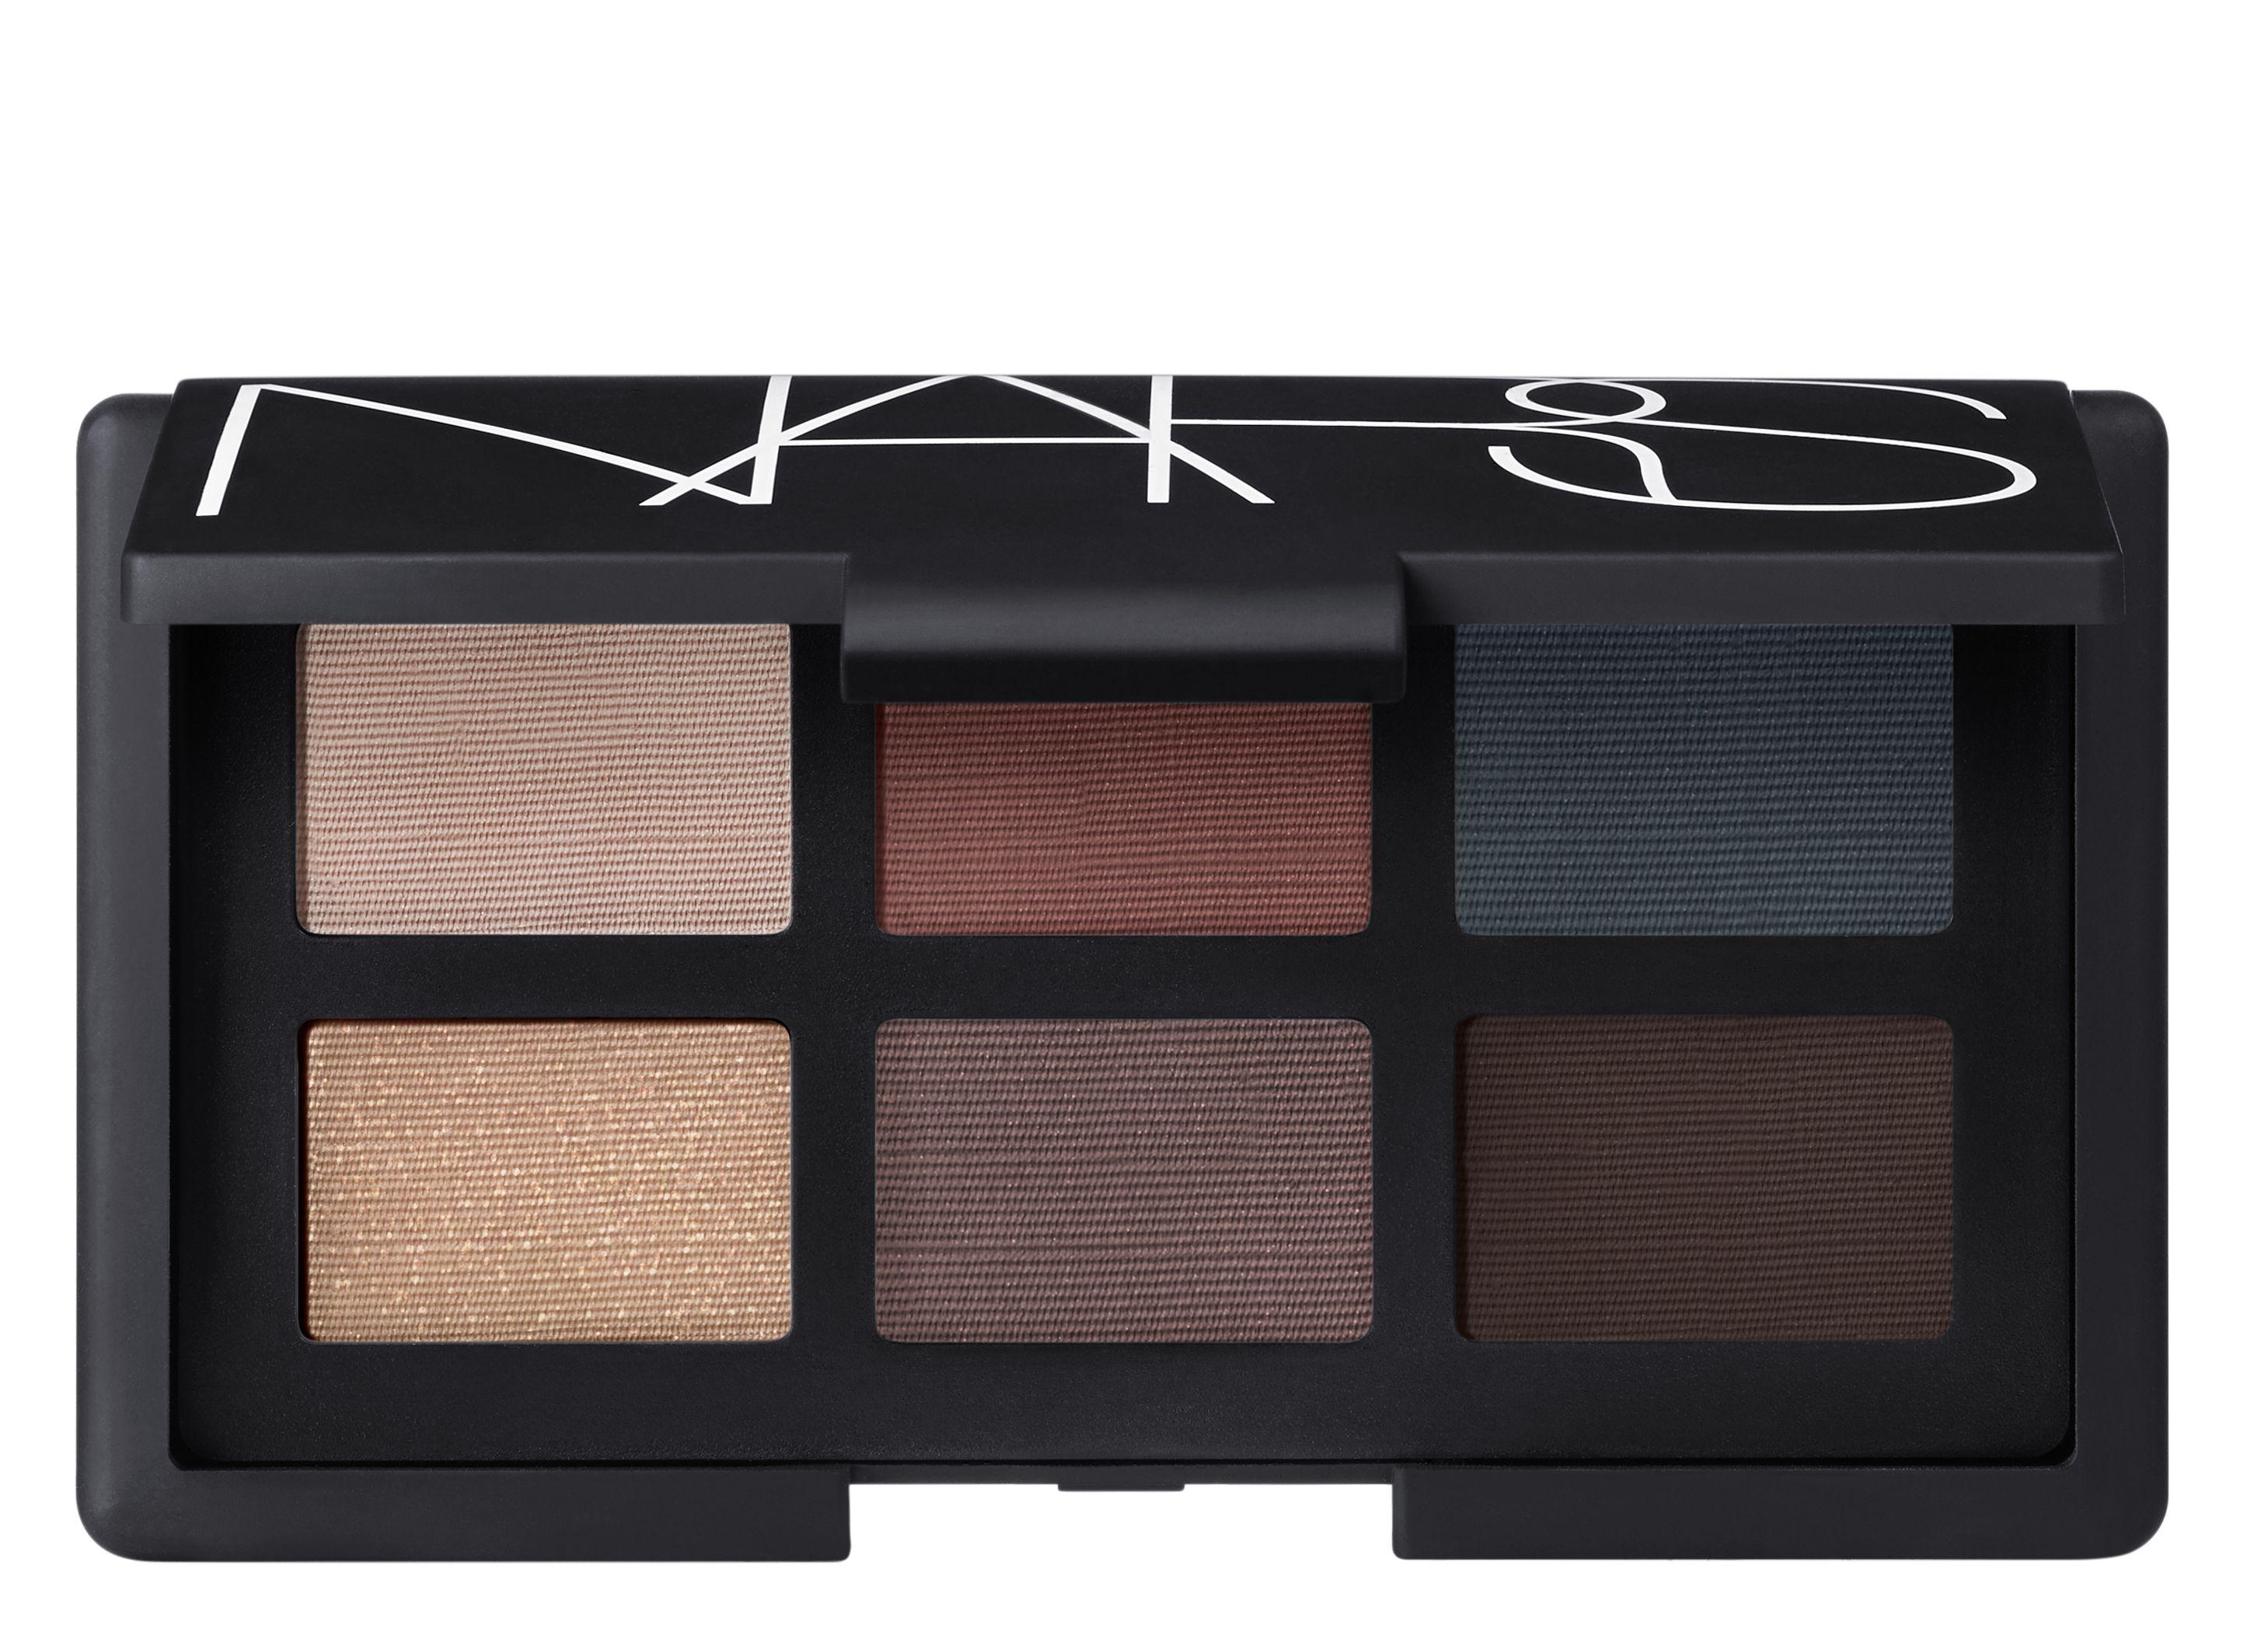 NARS Yeux Irresistible Eye Shadow Palette